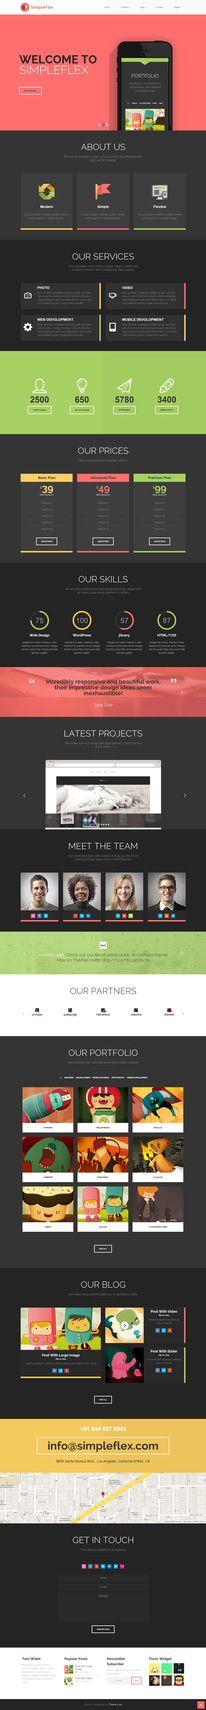 Squarespace - new homepage — Designspiration